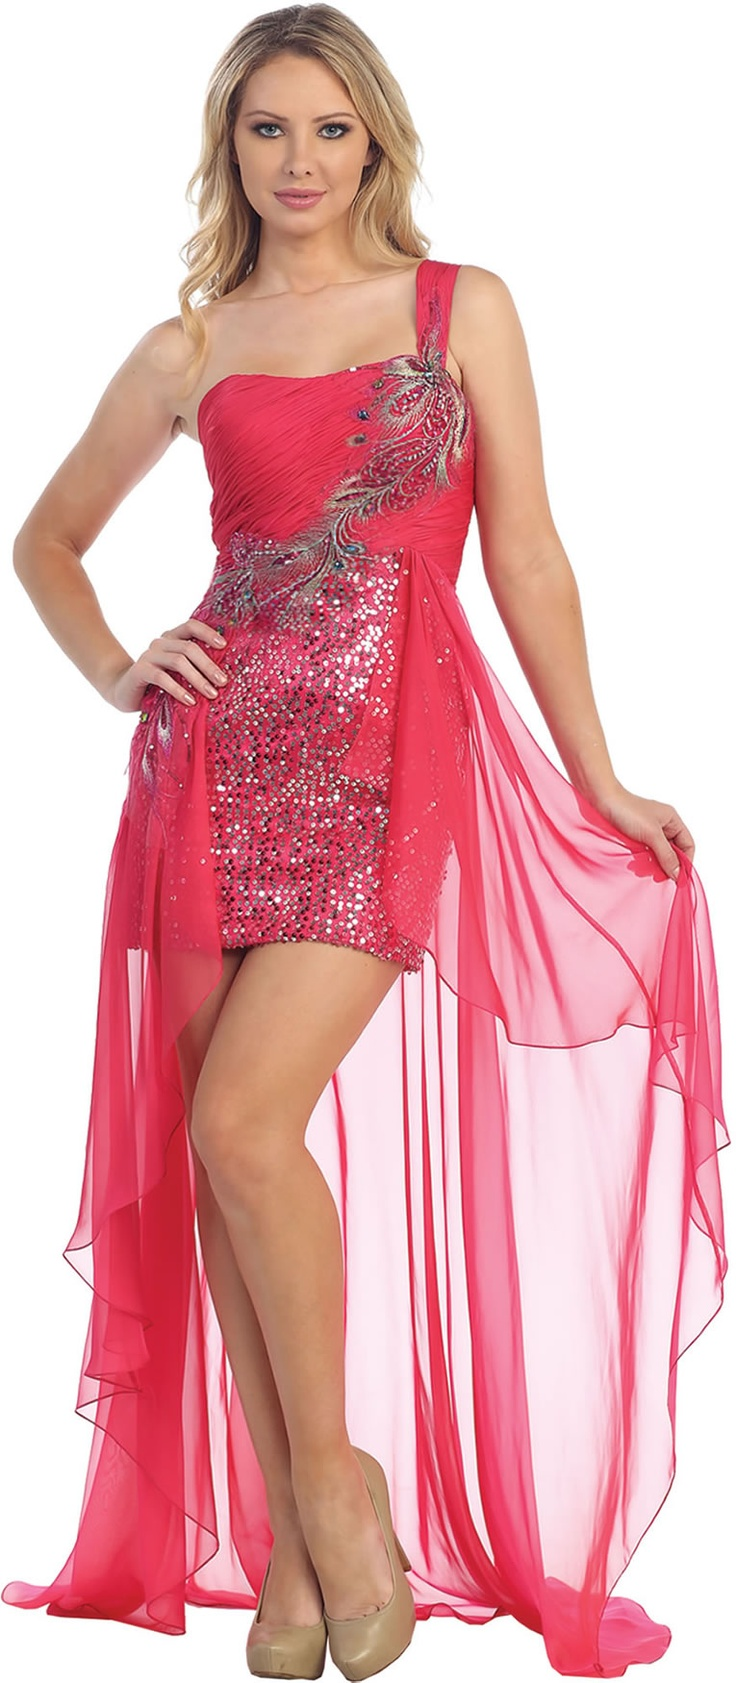 Mejores 95 imágenes de Prom dress en Pinterest | Vestidos de noche ...